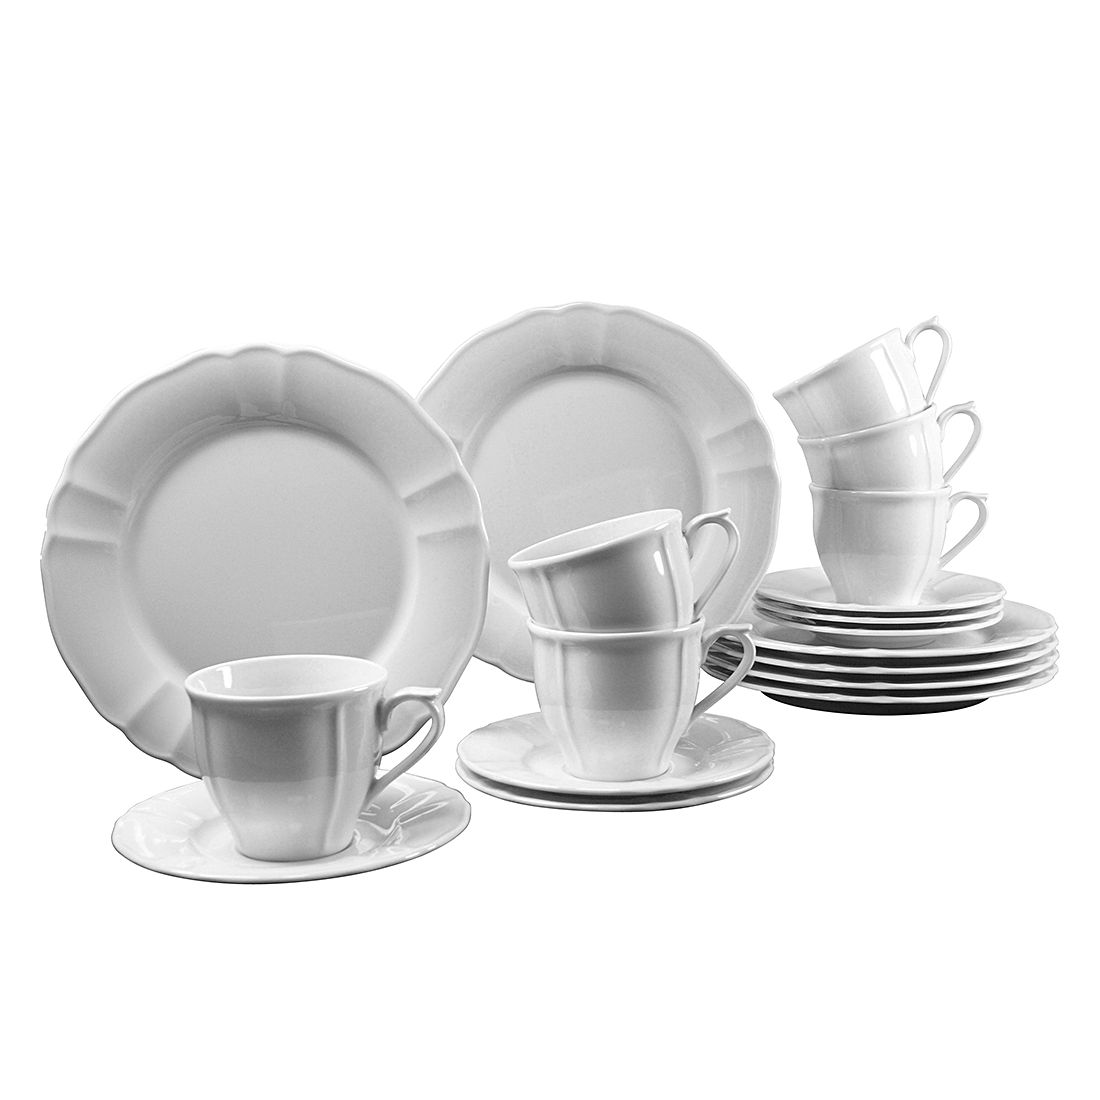 Kaffeeservice Flora (18-teilig) – Weiß, Creatable günstig bestellen